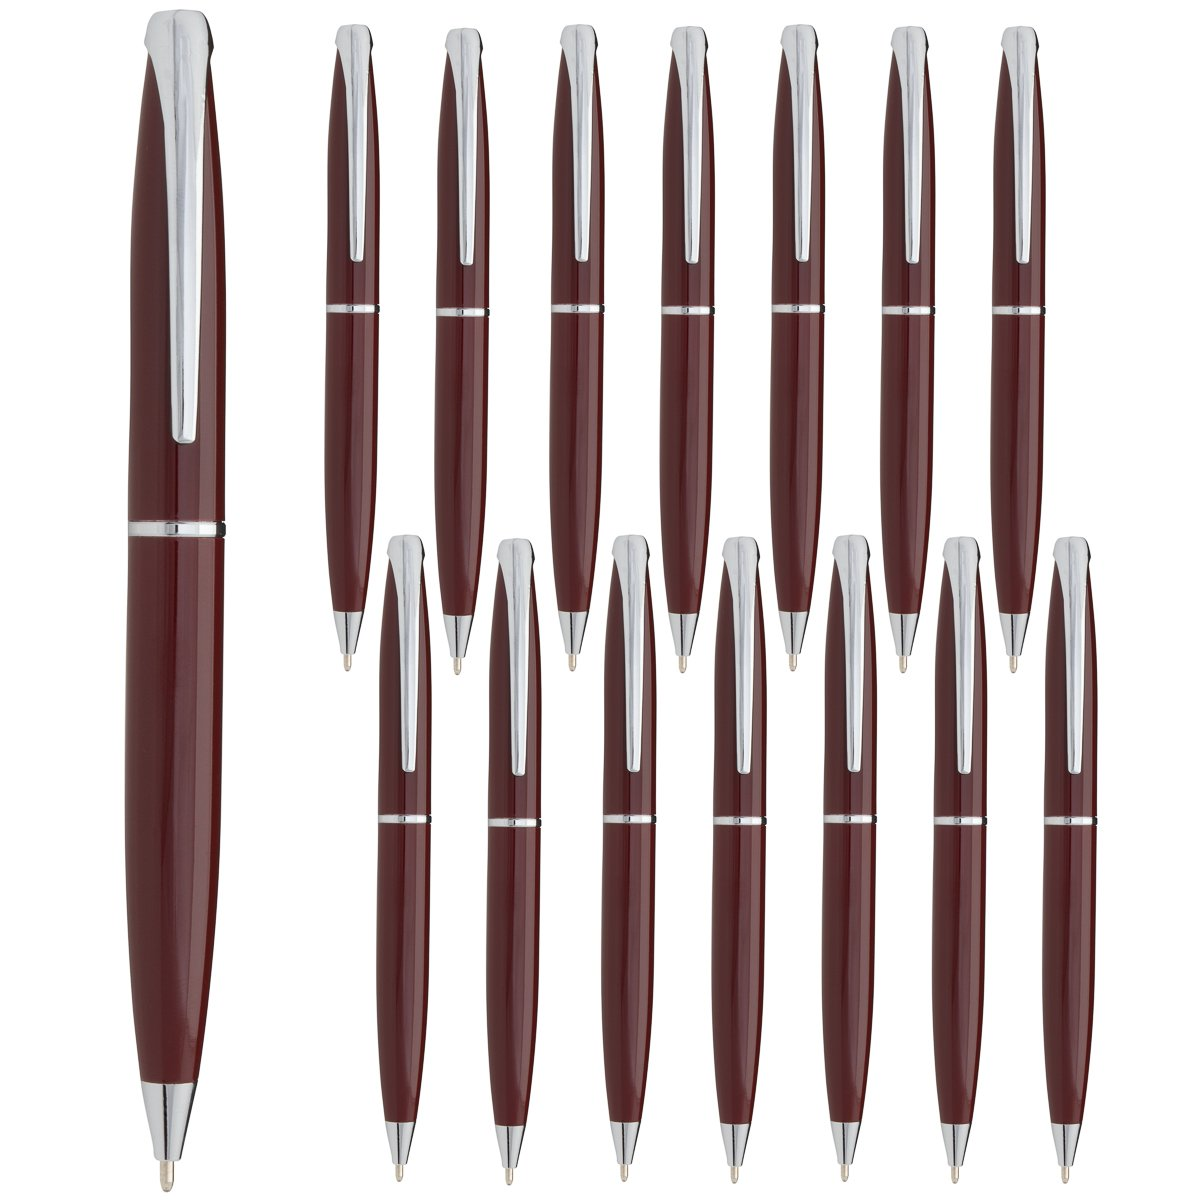 Estrella (15 Pack) Twist Pens Medium Point Ballpoint Pens Retractable Metal Ink Office Supplies by Estrella (Image #1)